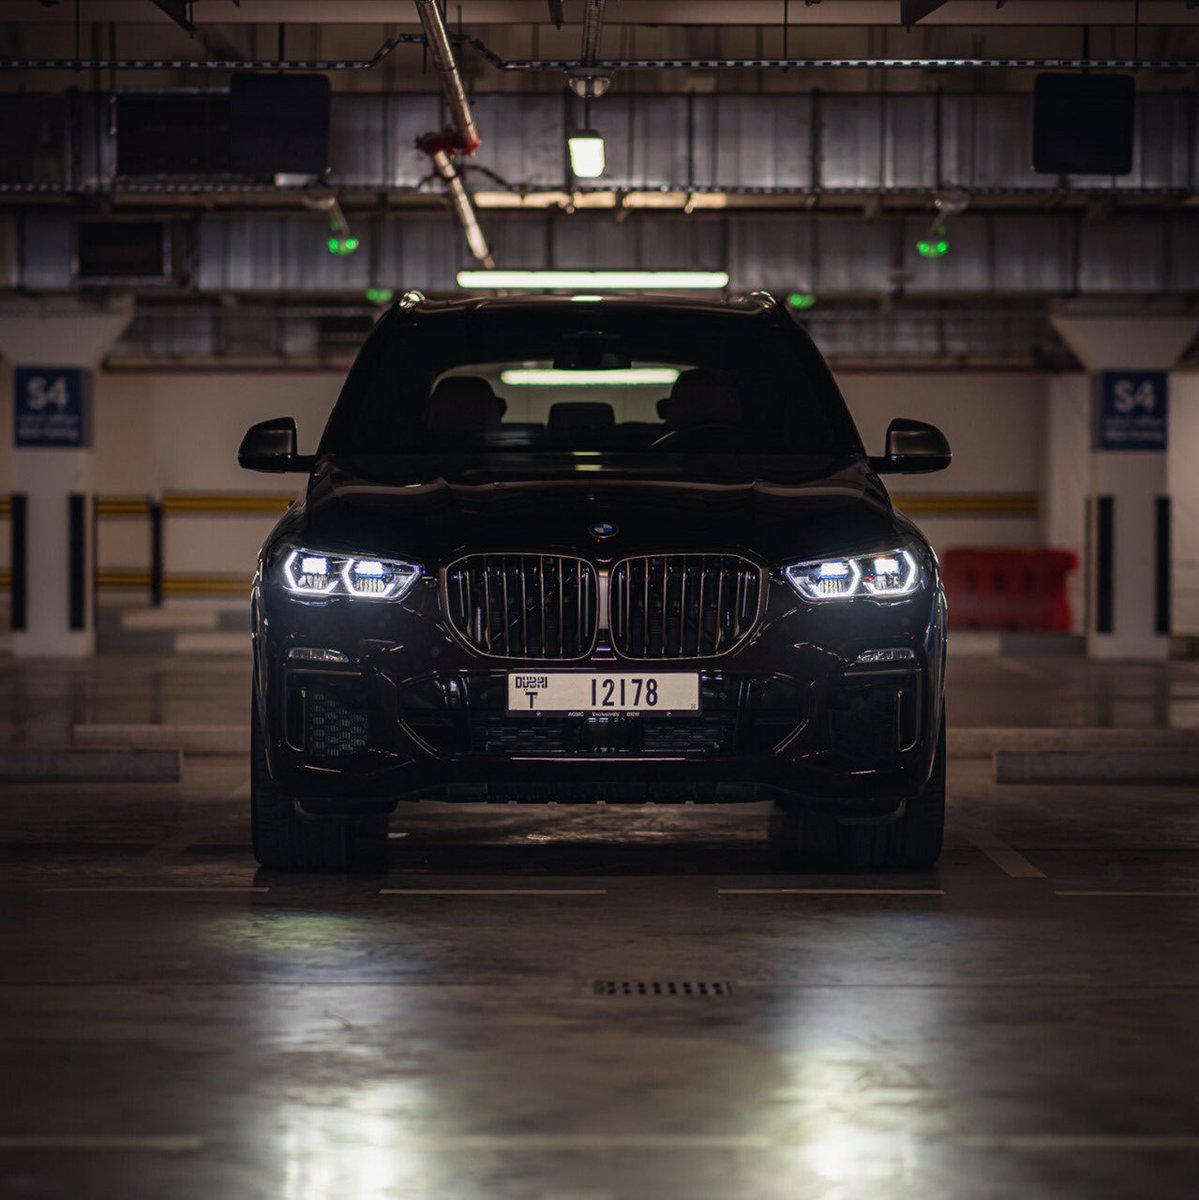 When power stares right back.   #BMWX5 #BMWAGMC https://t.co/nJ5PCcDB9K